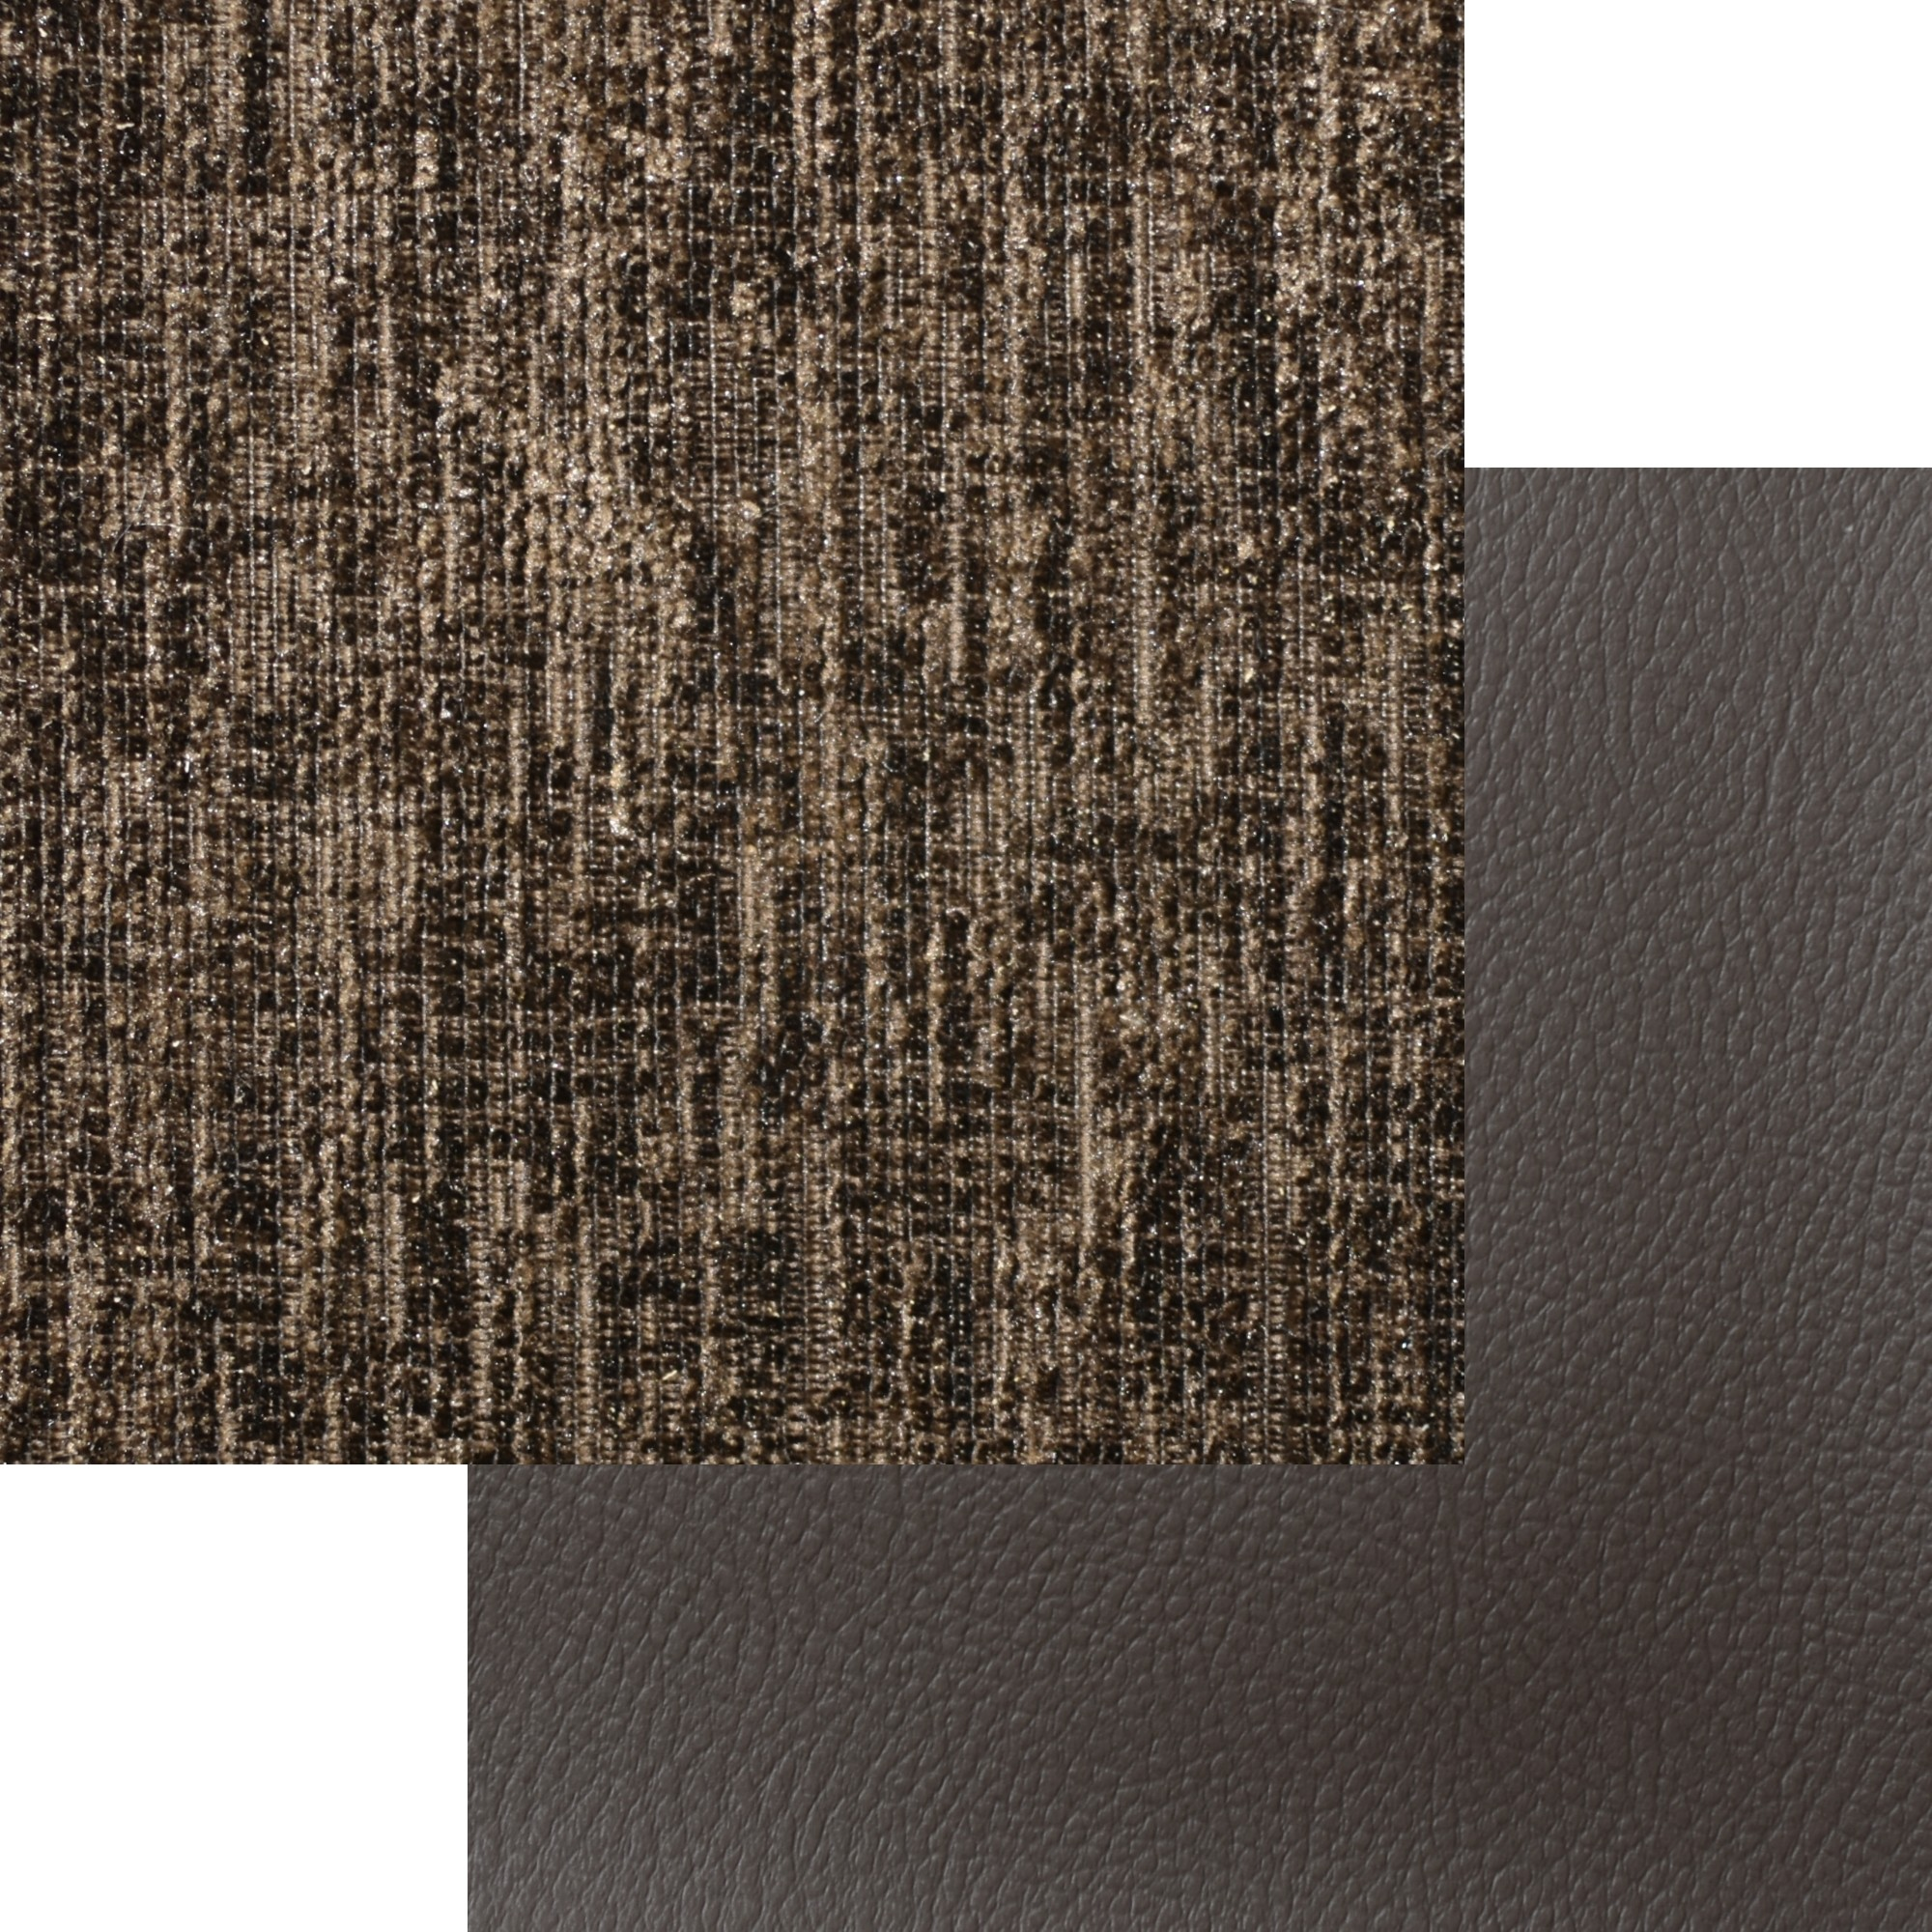 Arizona Fabric 3+2 Seater Sofa Brown and Brown